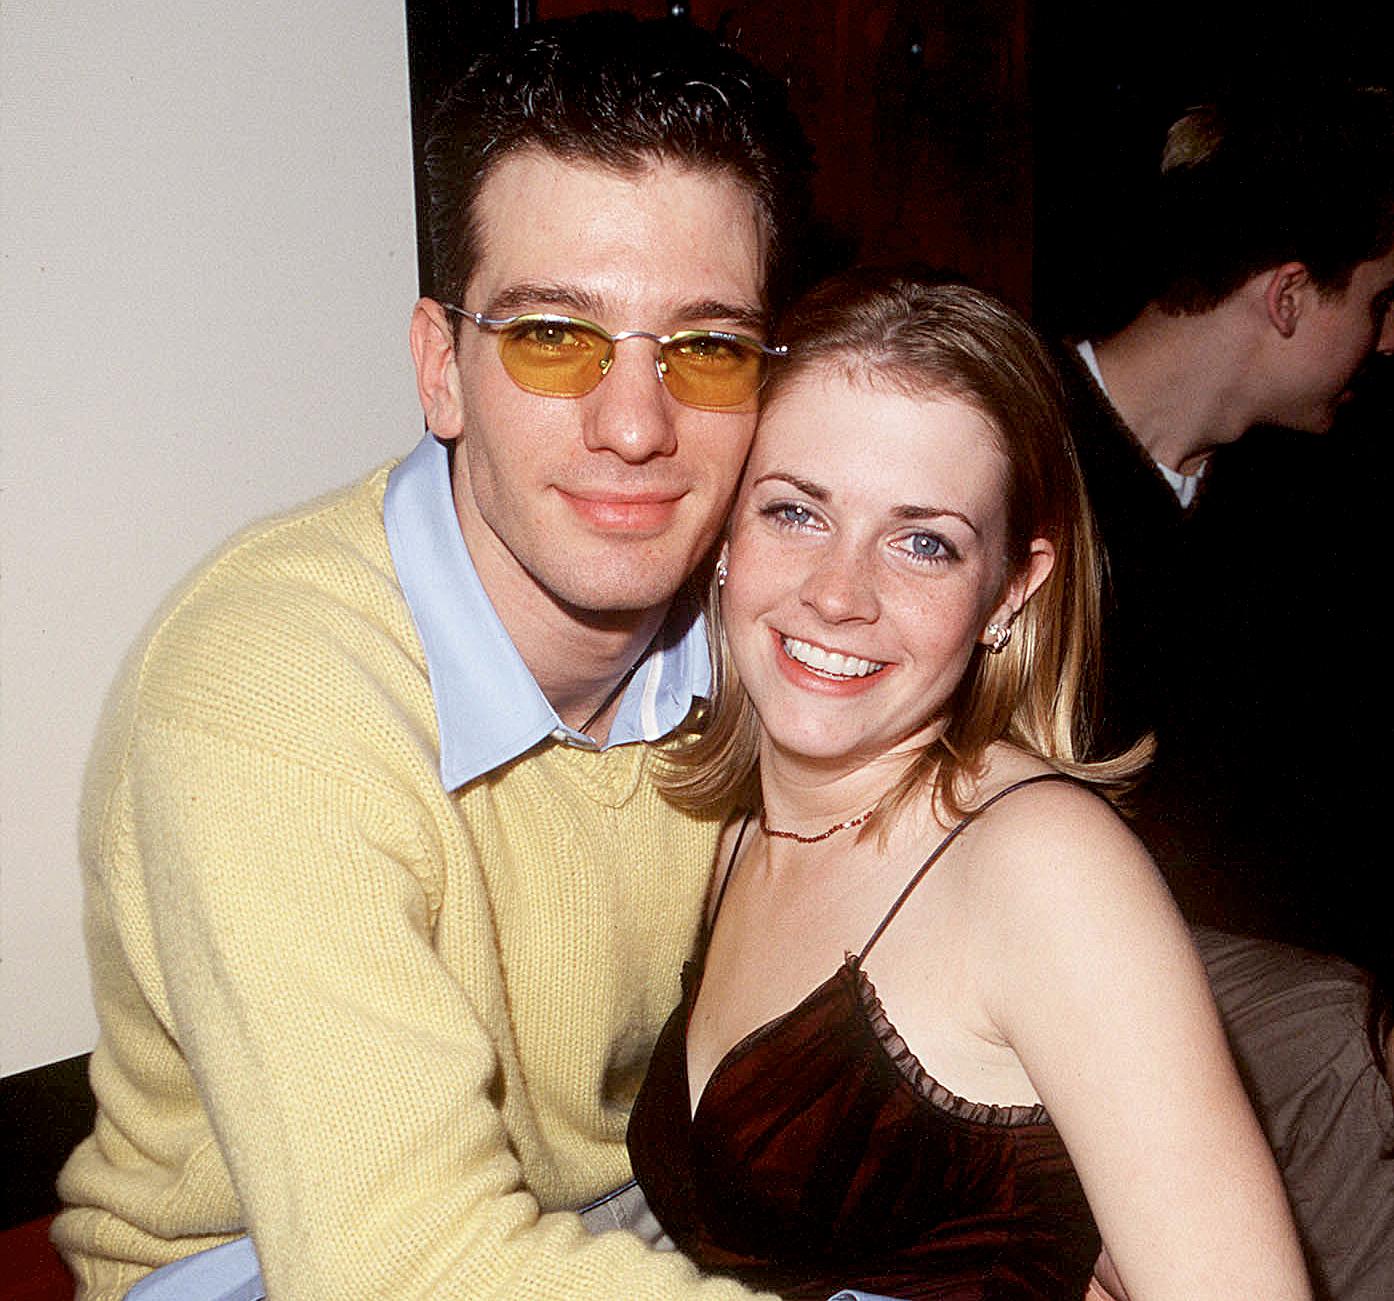 Whos dating melissa joan hart